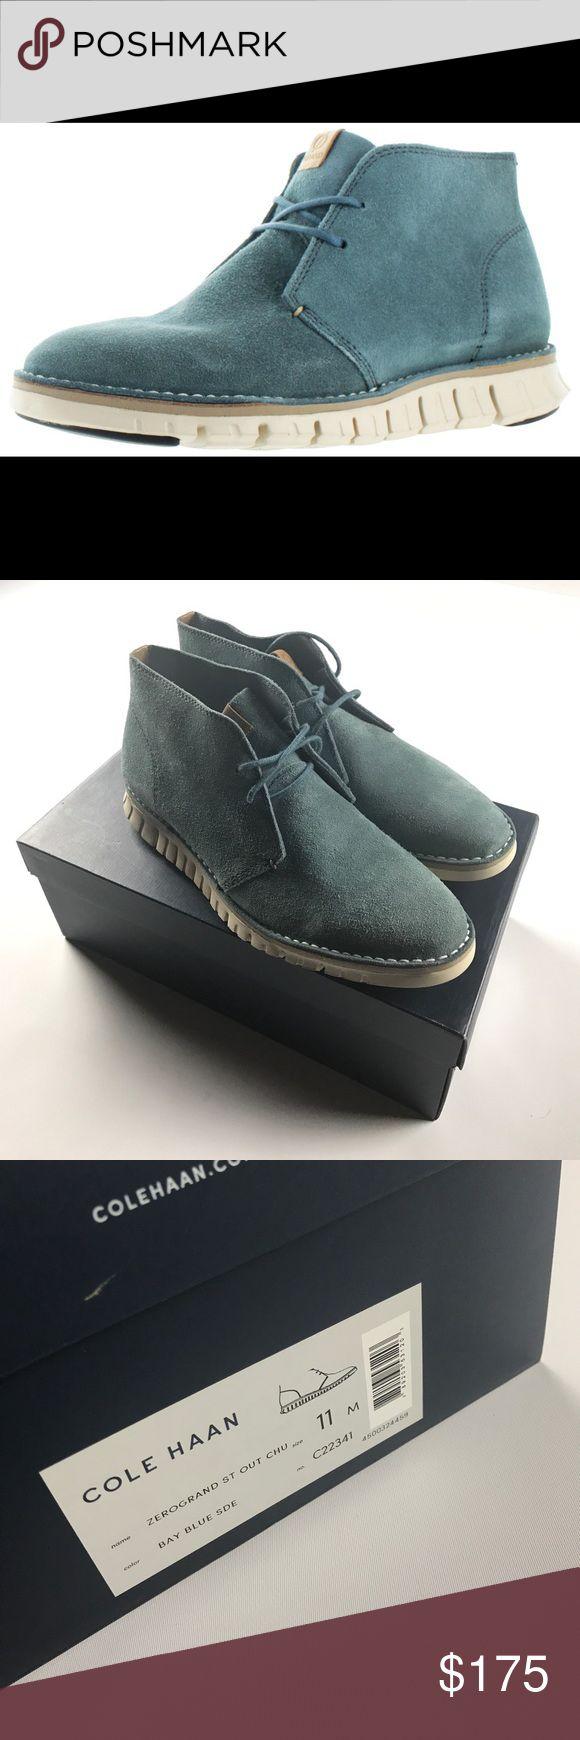 New 11 Cole Haan Zerogrand Stitch Out Chukka Boots New Cole Haan Shoes Chukka Boots